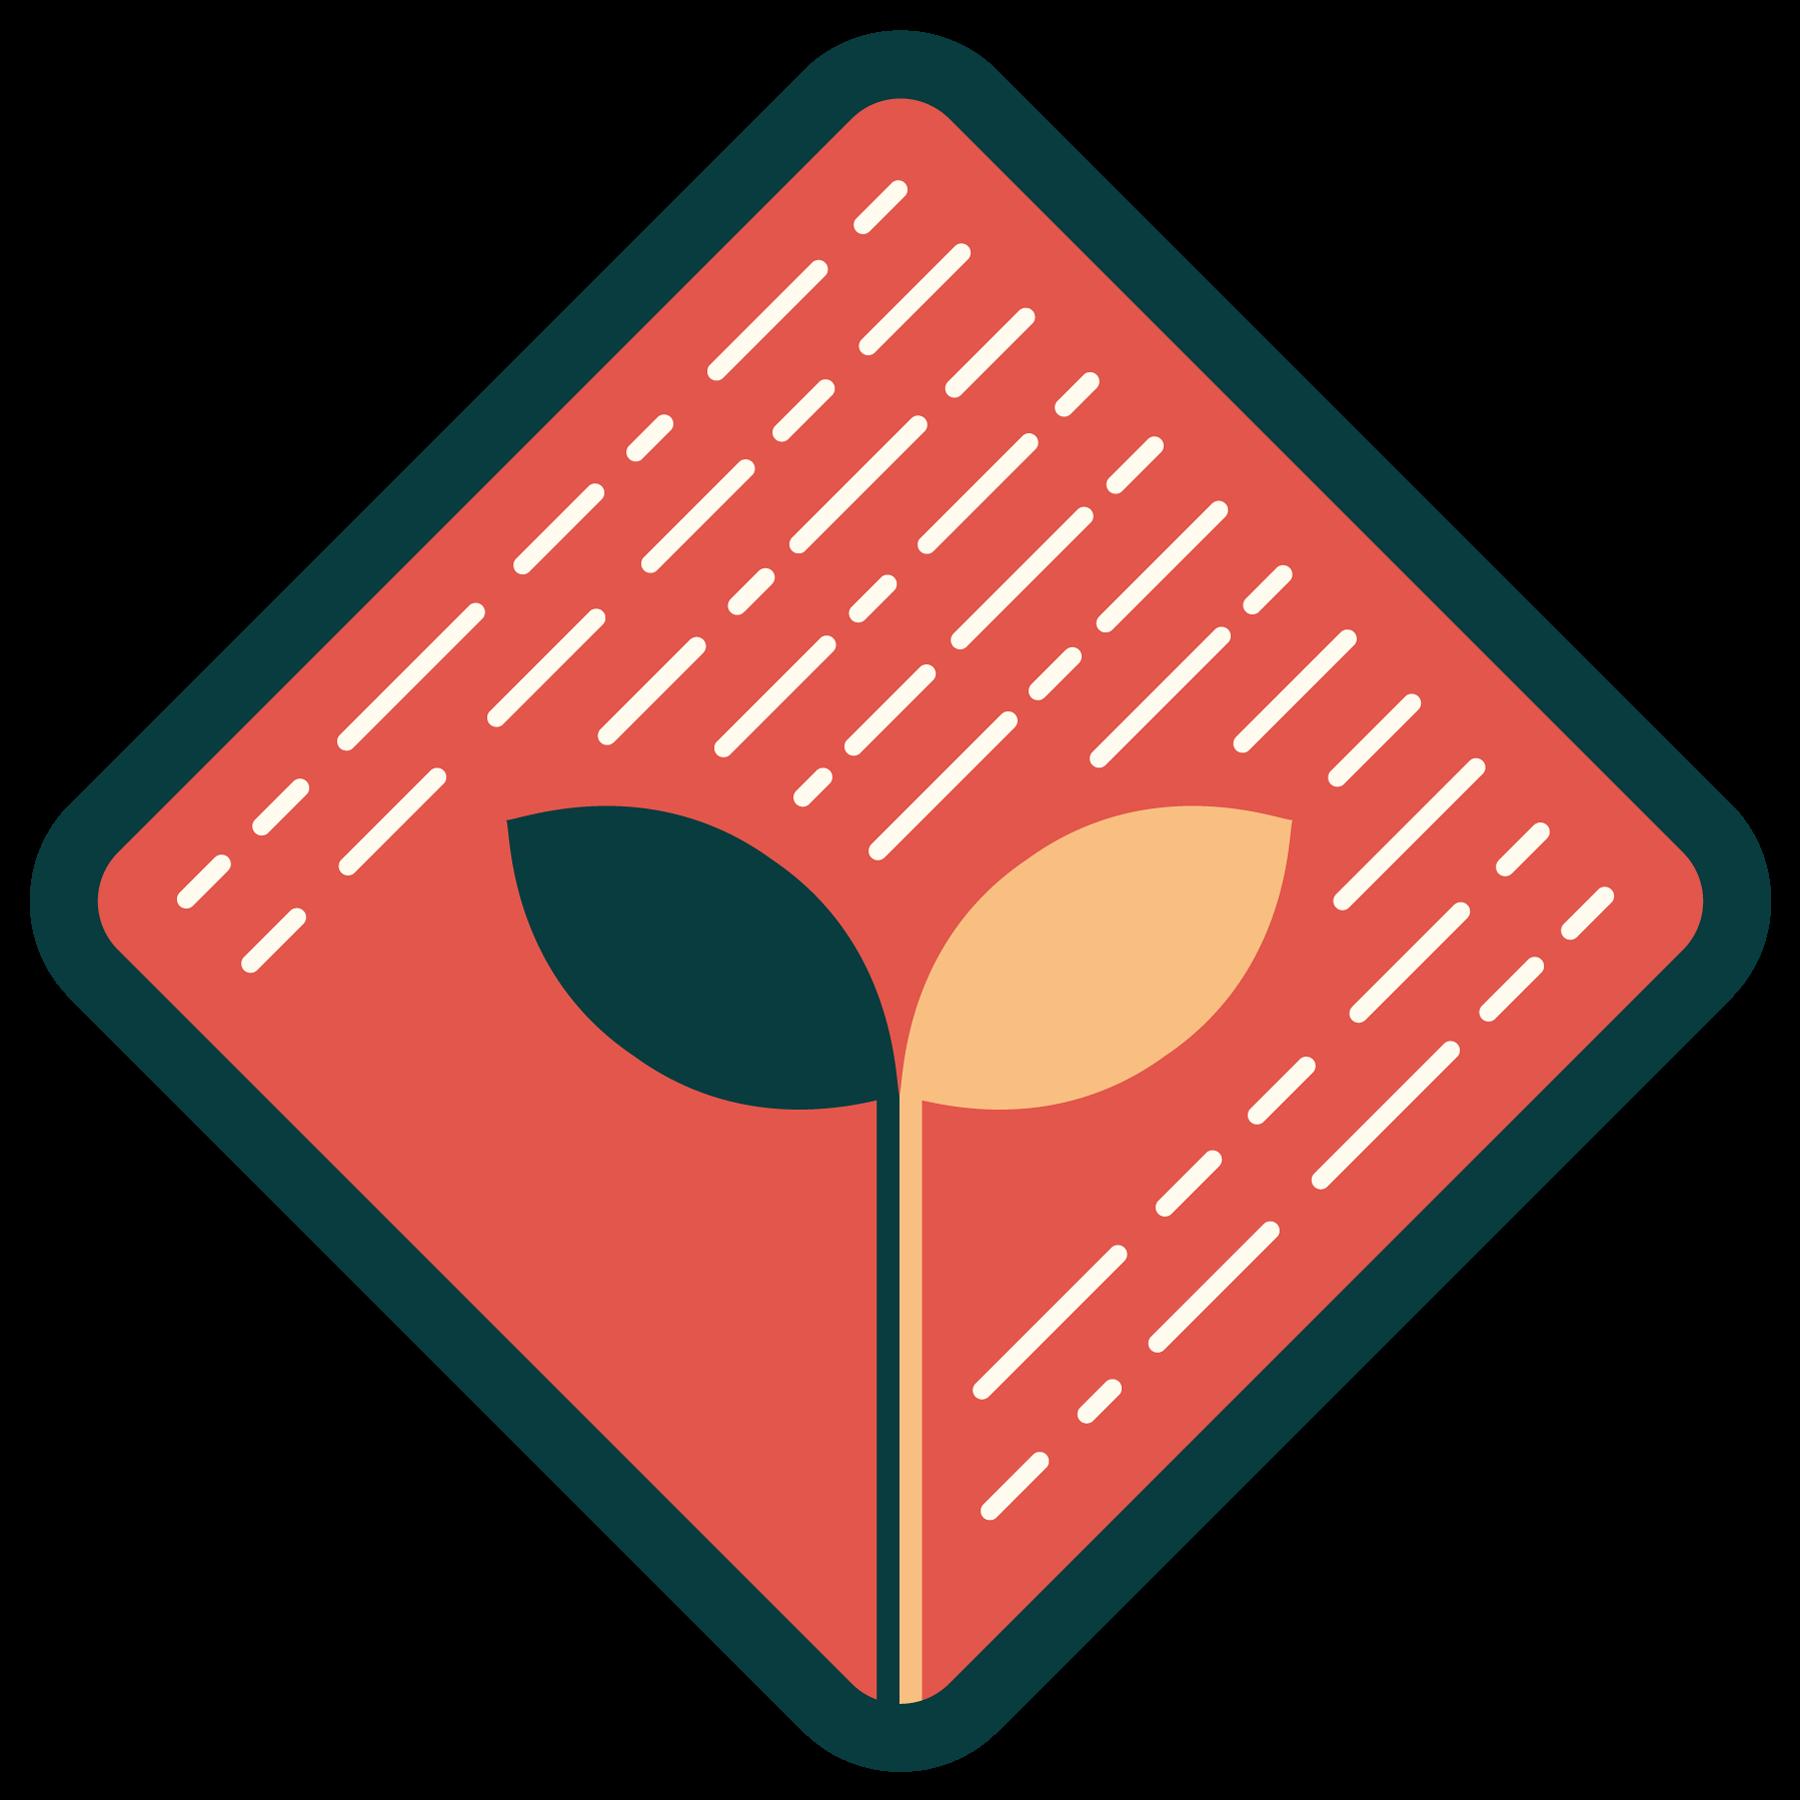 LFF009-Plant-Vector-Badge.png